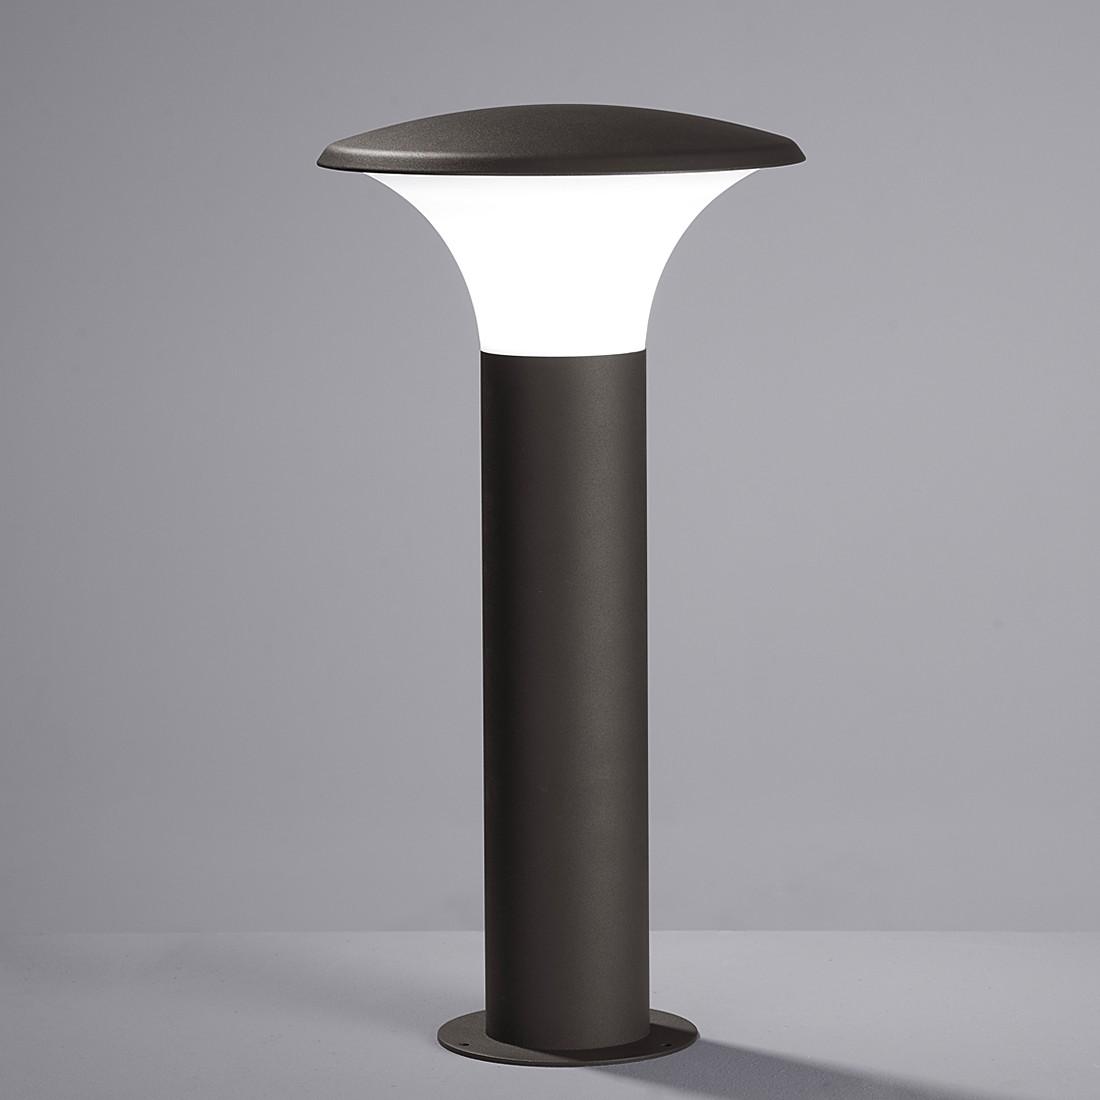 LED-Außenleuchte Kongo 1-flammig ● Aluminium Kunststoff ● Silber- Trio A++